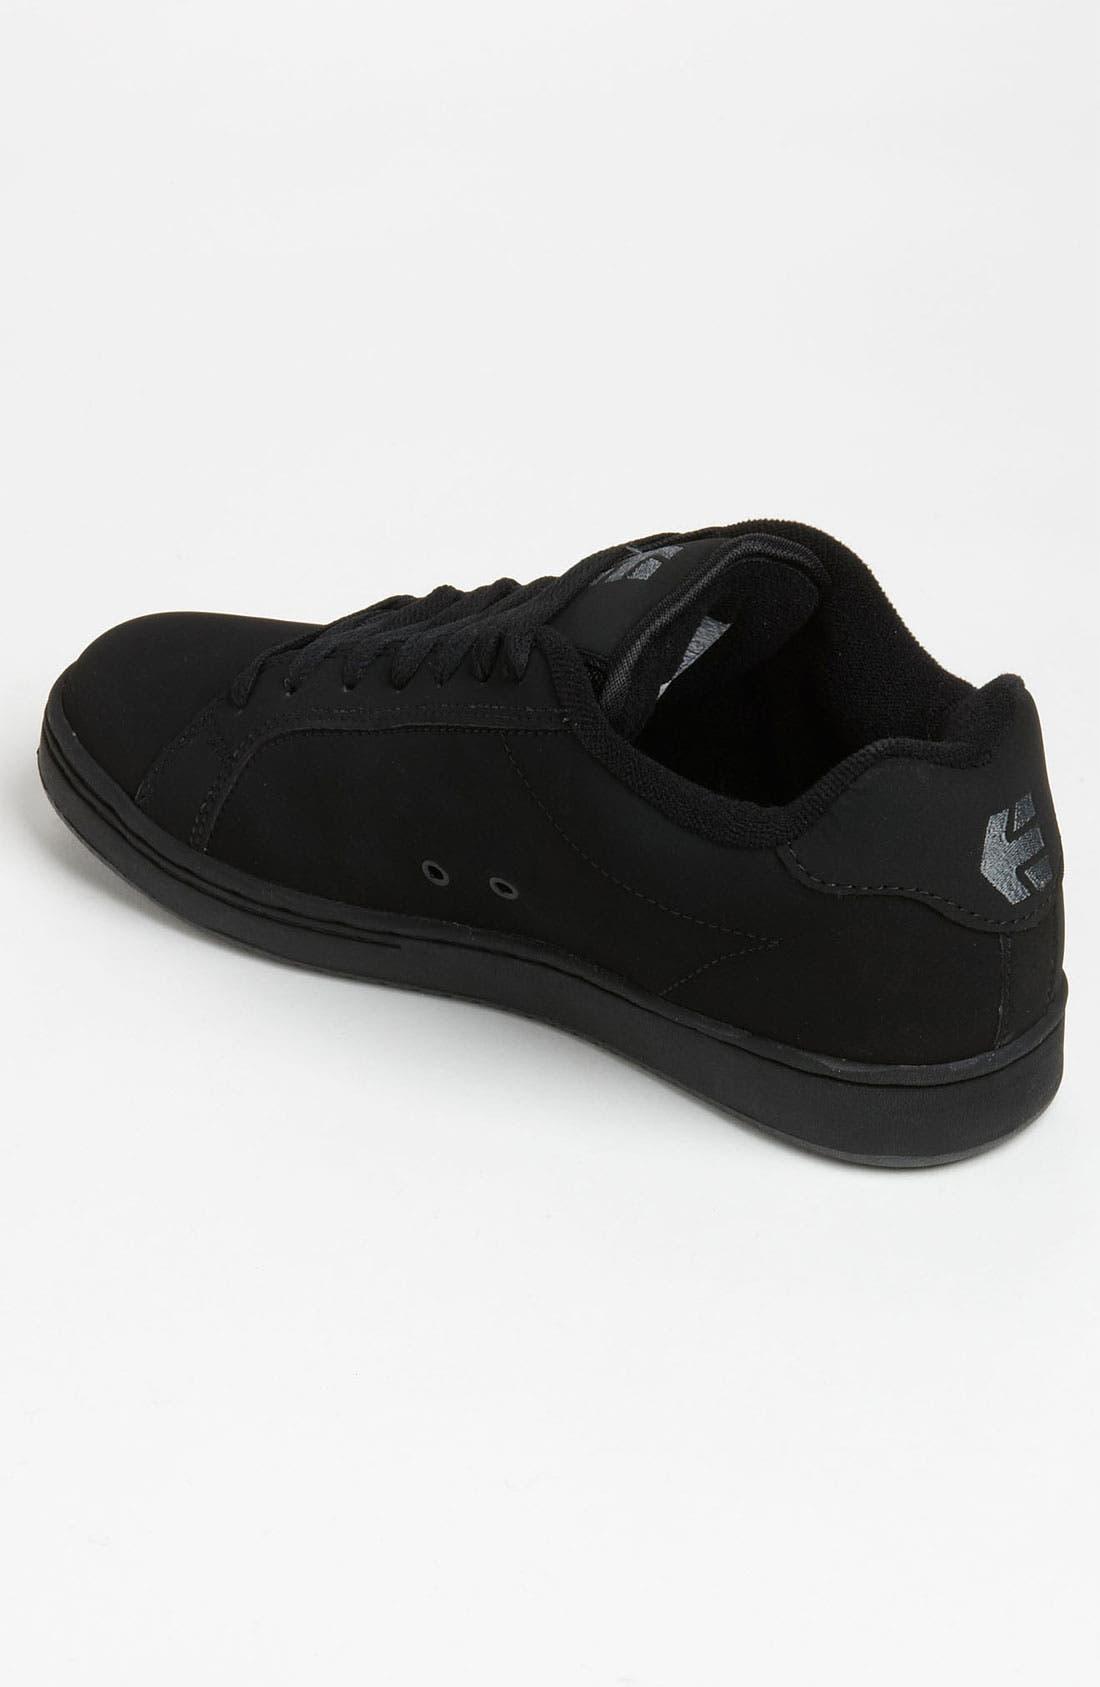 Alternate Image 2  - Etnies 'Fader' Skate Shoe (Men)